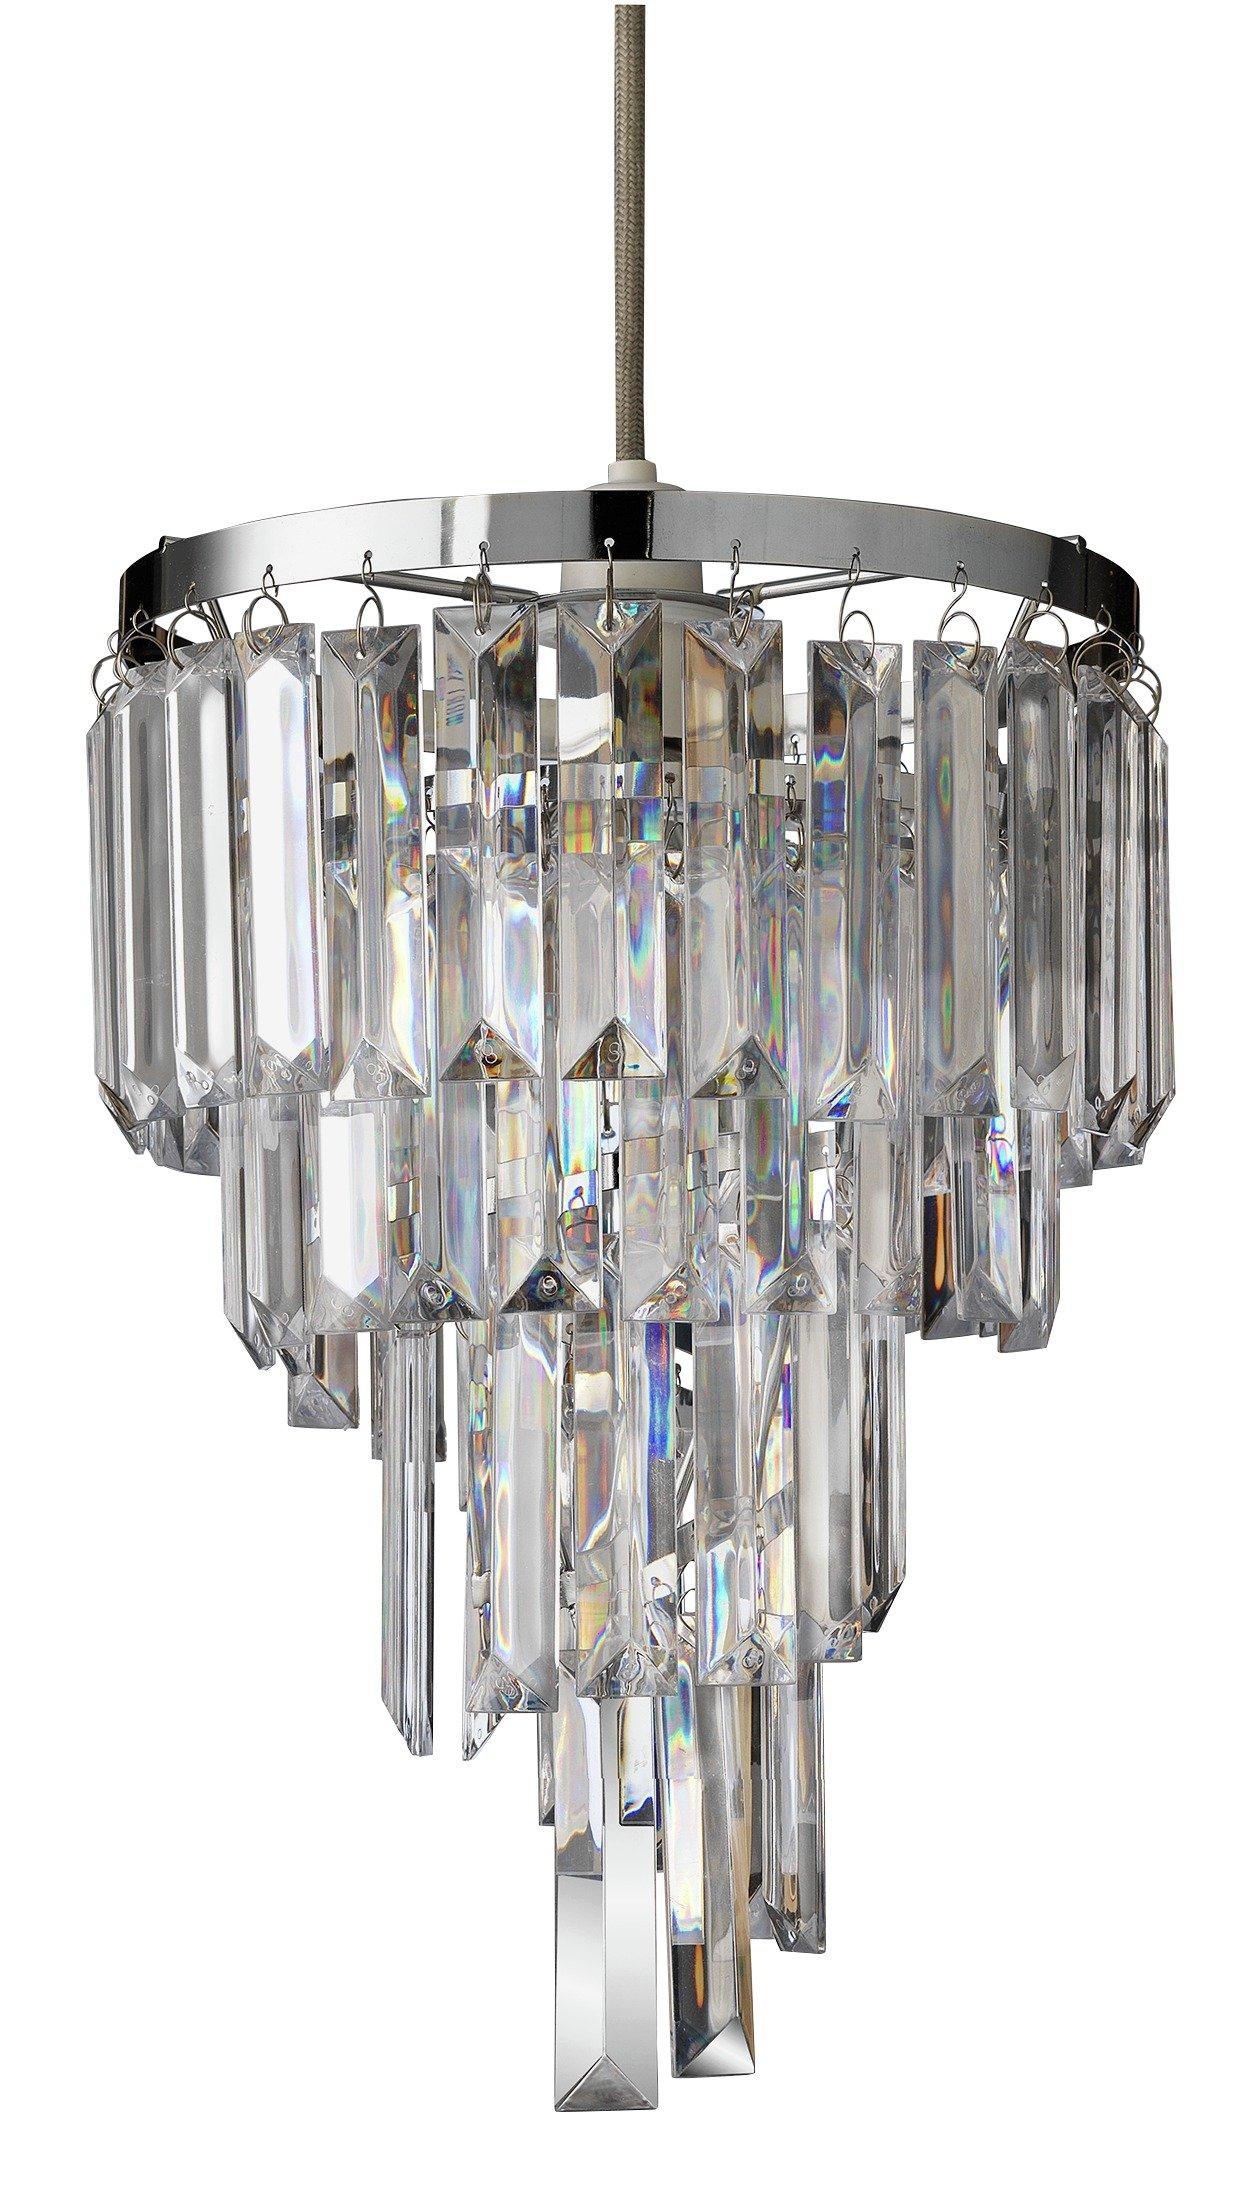 Argos Home Spiral Acrylic & Chrome Pendant Light Shade